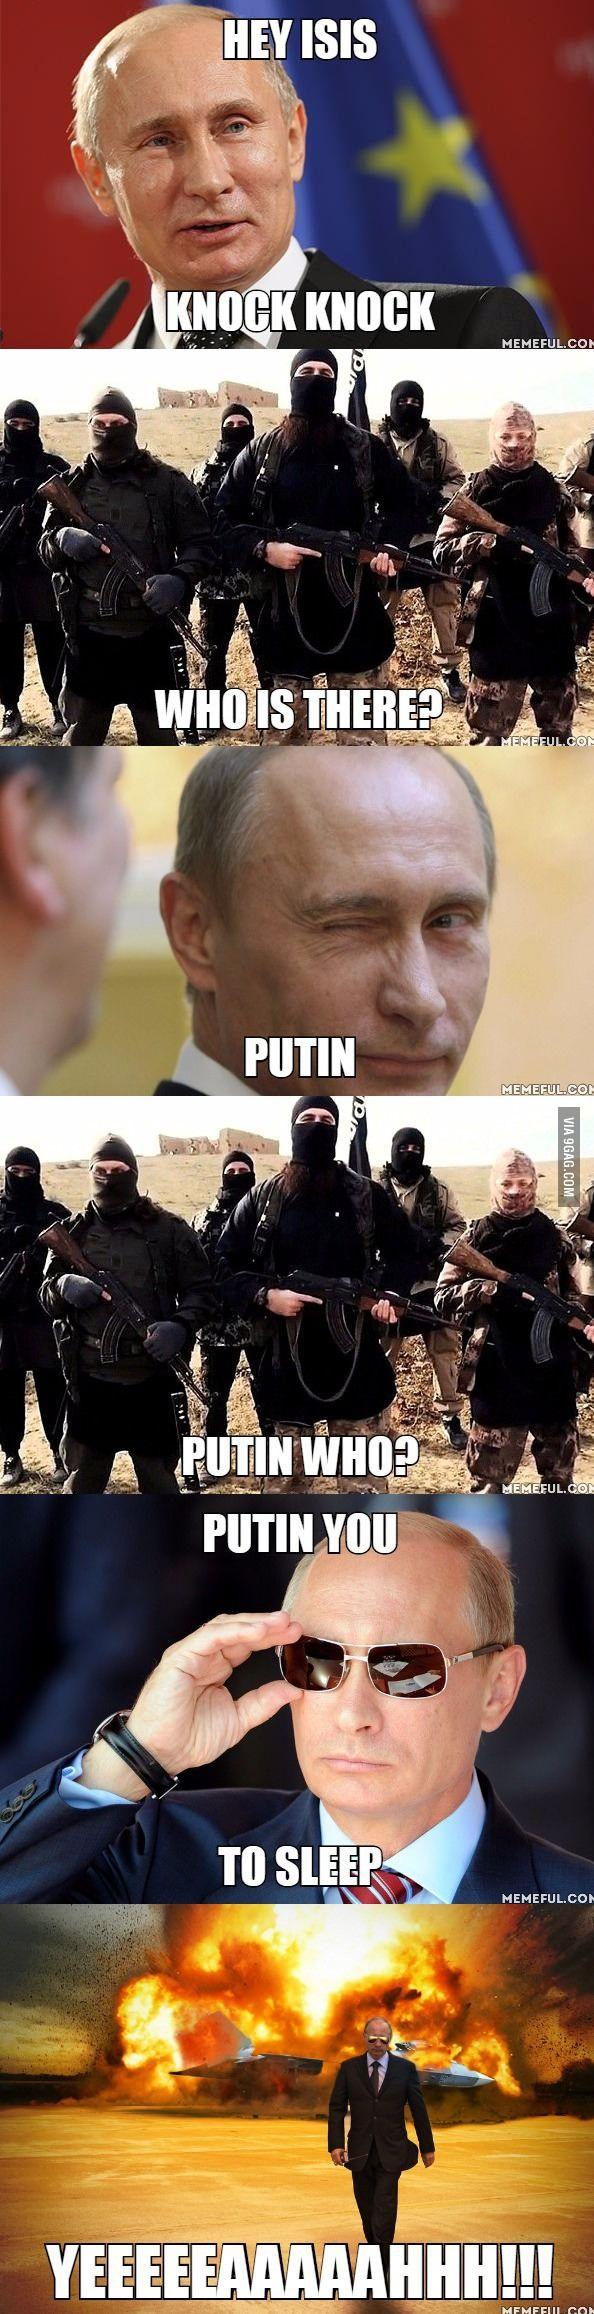 Original and creative title that describes Putin's badassery